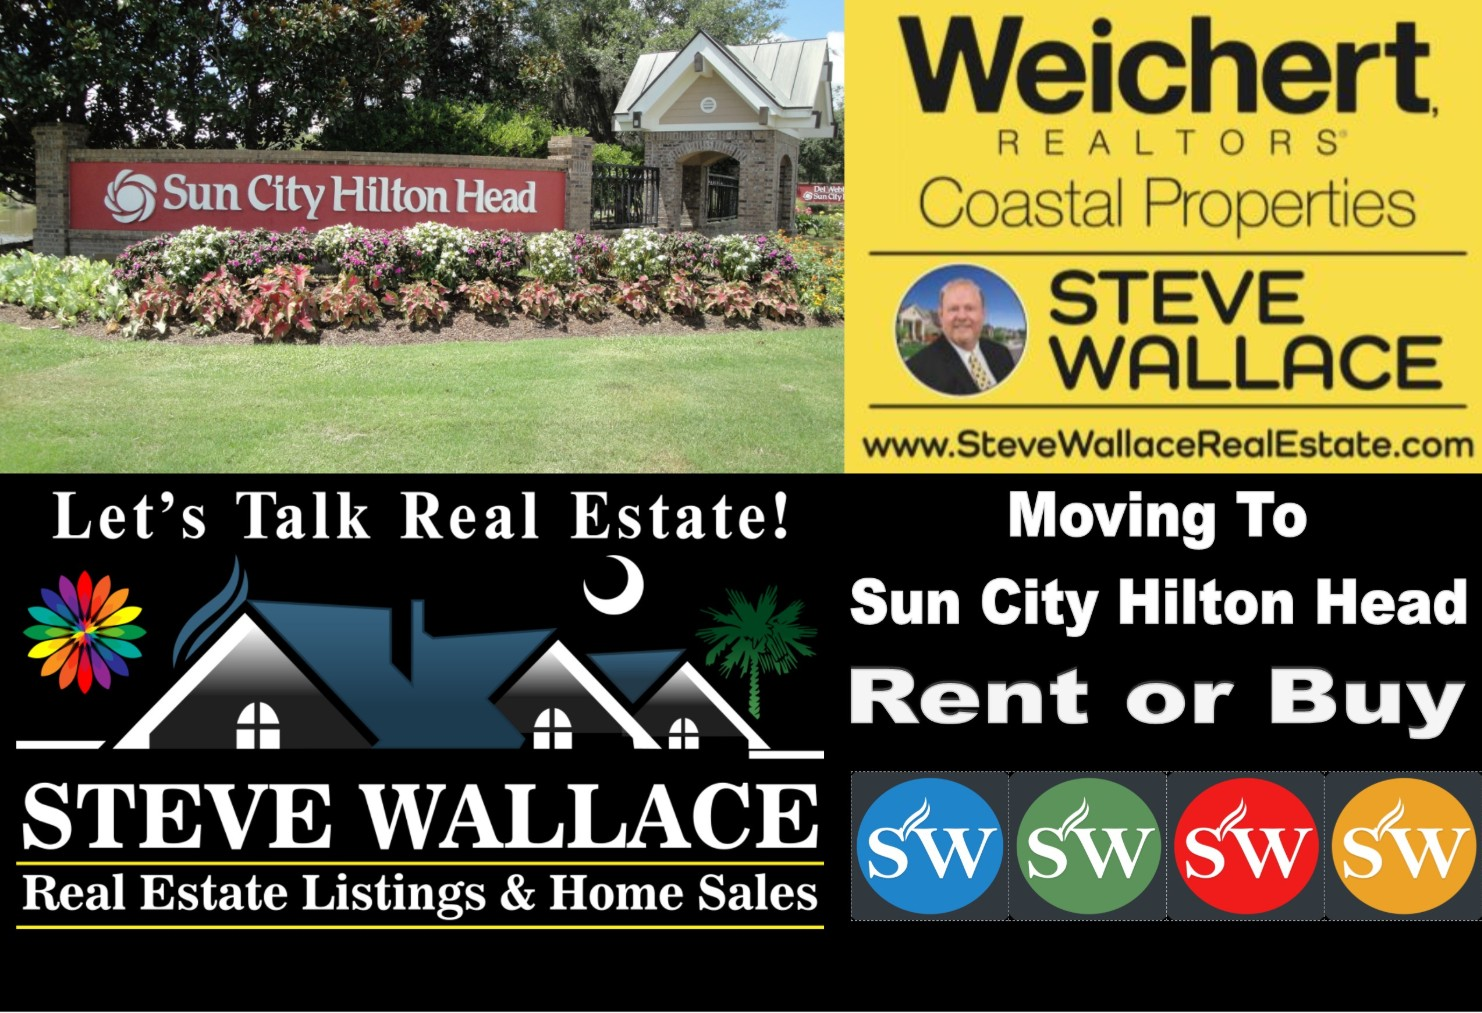 Sun City Hilton Head, Moving, Rent, Buy, Home, Real Estate